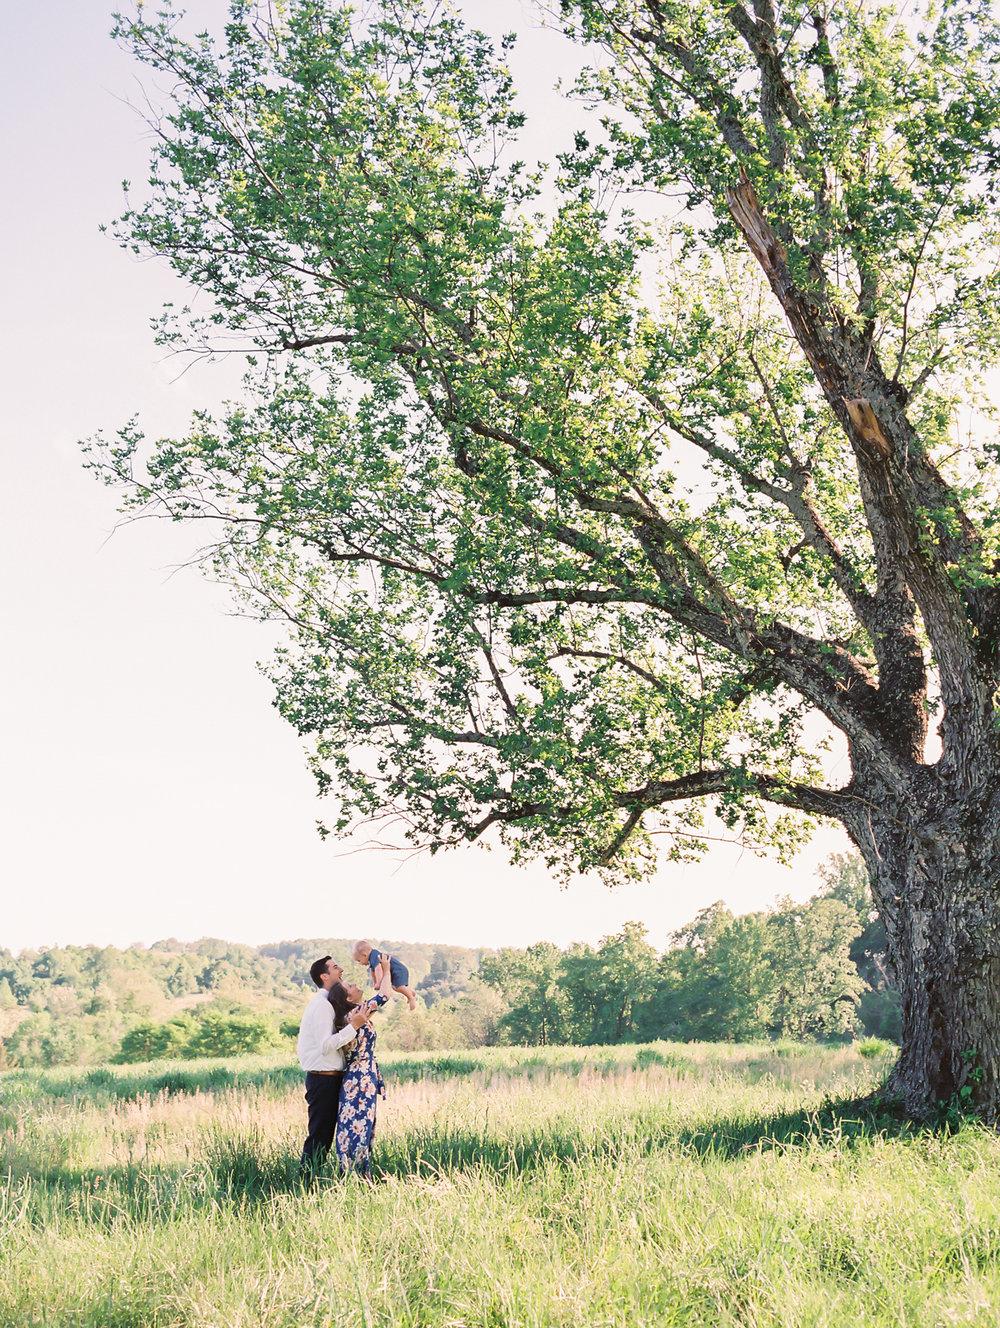 lynchburg_charlotte_family_wedding_film_photographer_virginia_north_carolina-1-2.jpg